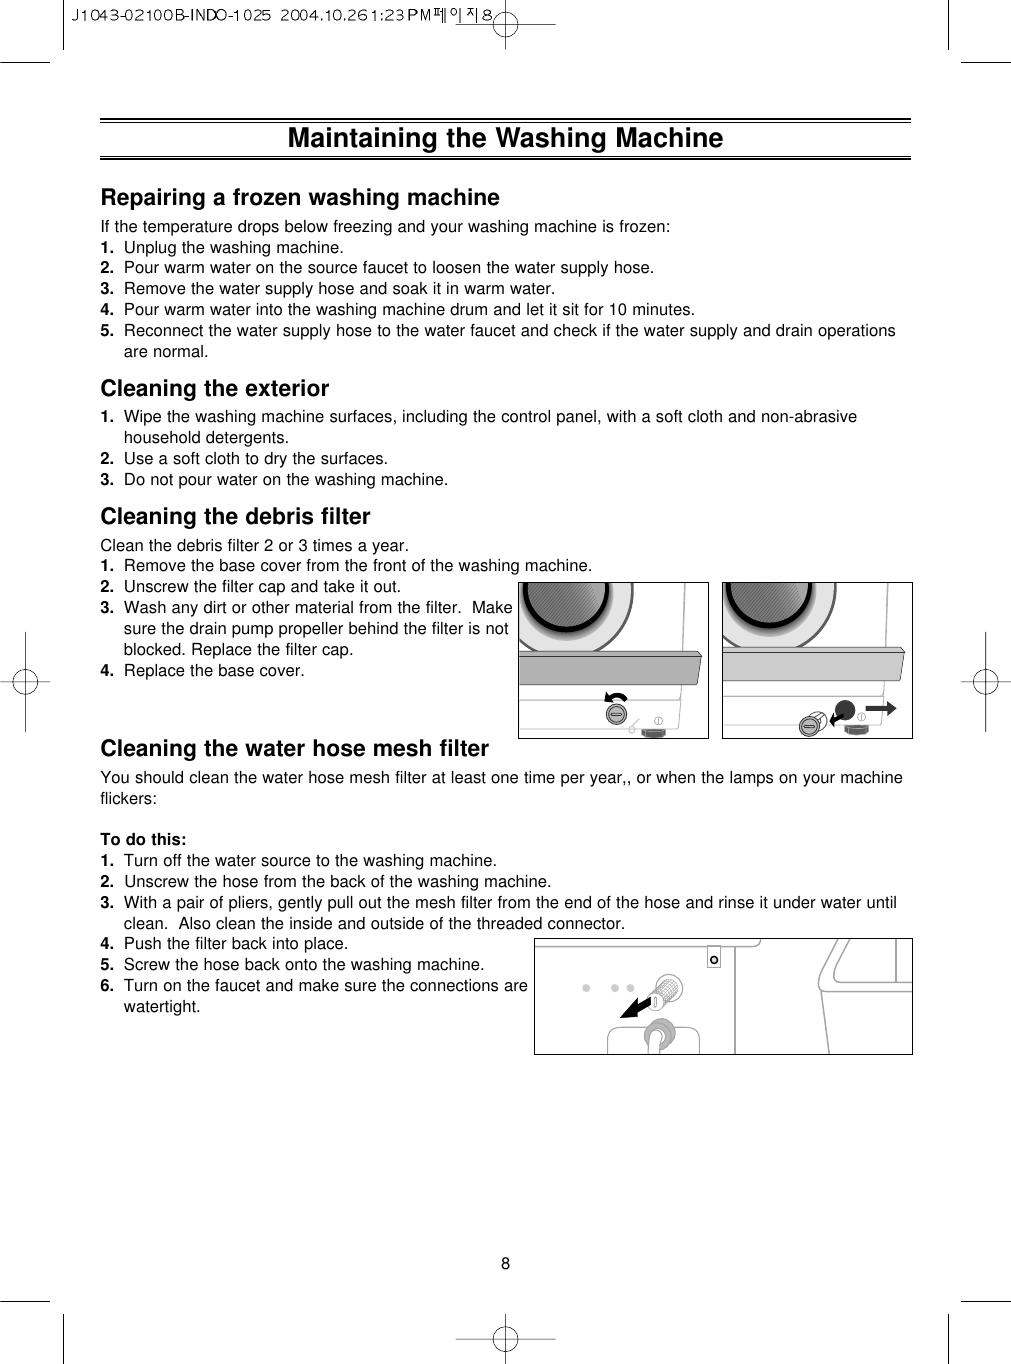 Samsung F1043 F843 Users Manual J1043 02100B INDO 1025